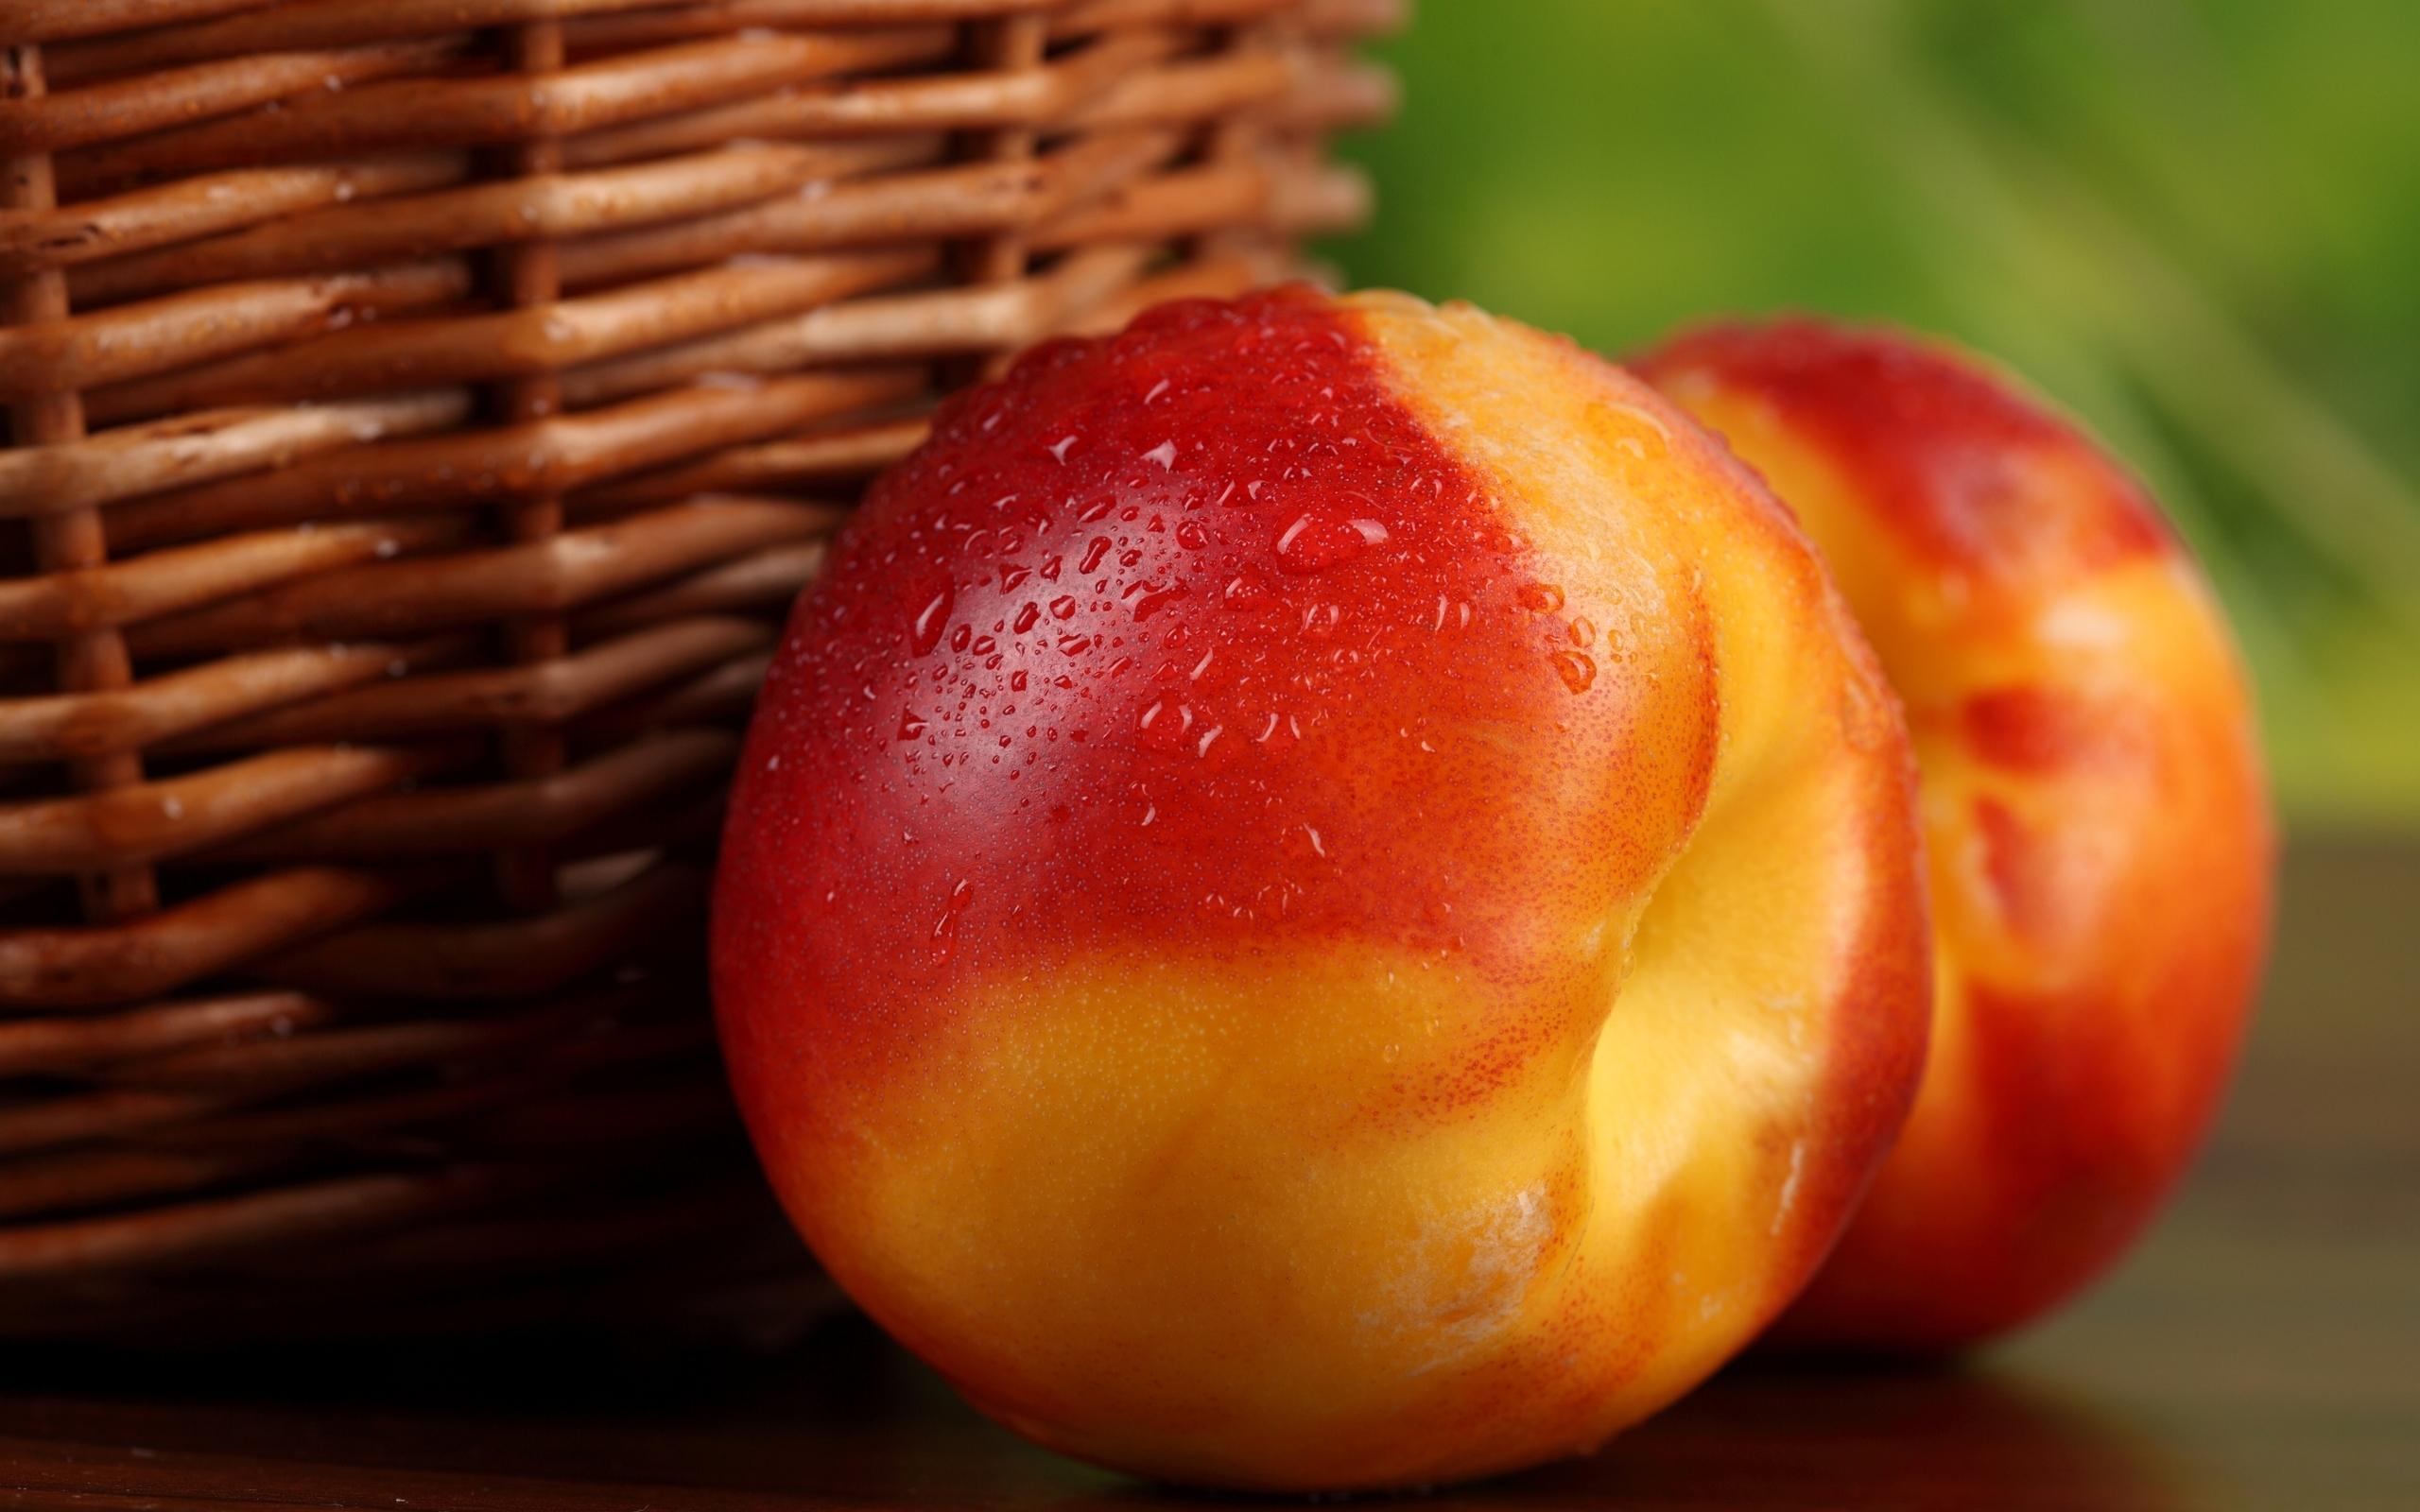 Peach HD Wallpaper | Background Image | 2560x1600 | ID ...